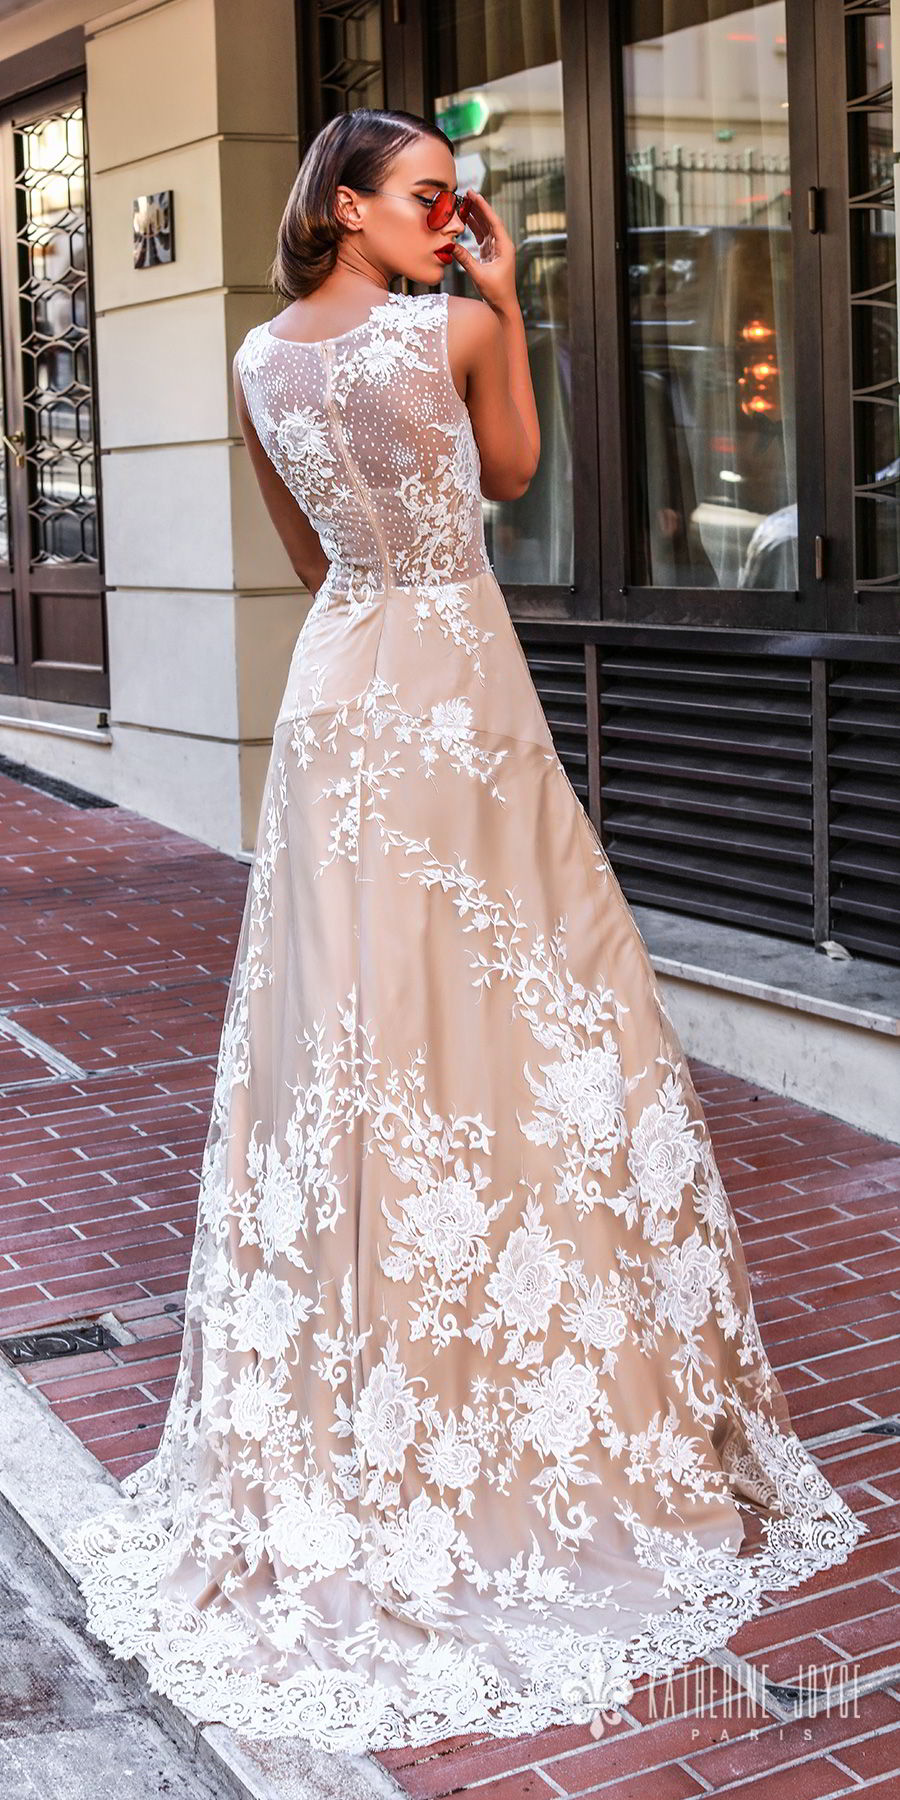 katherine joyce 2018 bridal sleeveless jewel neck full embellishment elegant romantic champagne color a  line wedding dress sheer lace back sweep train (marisabelle) bv